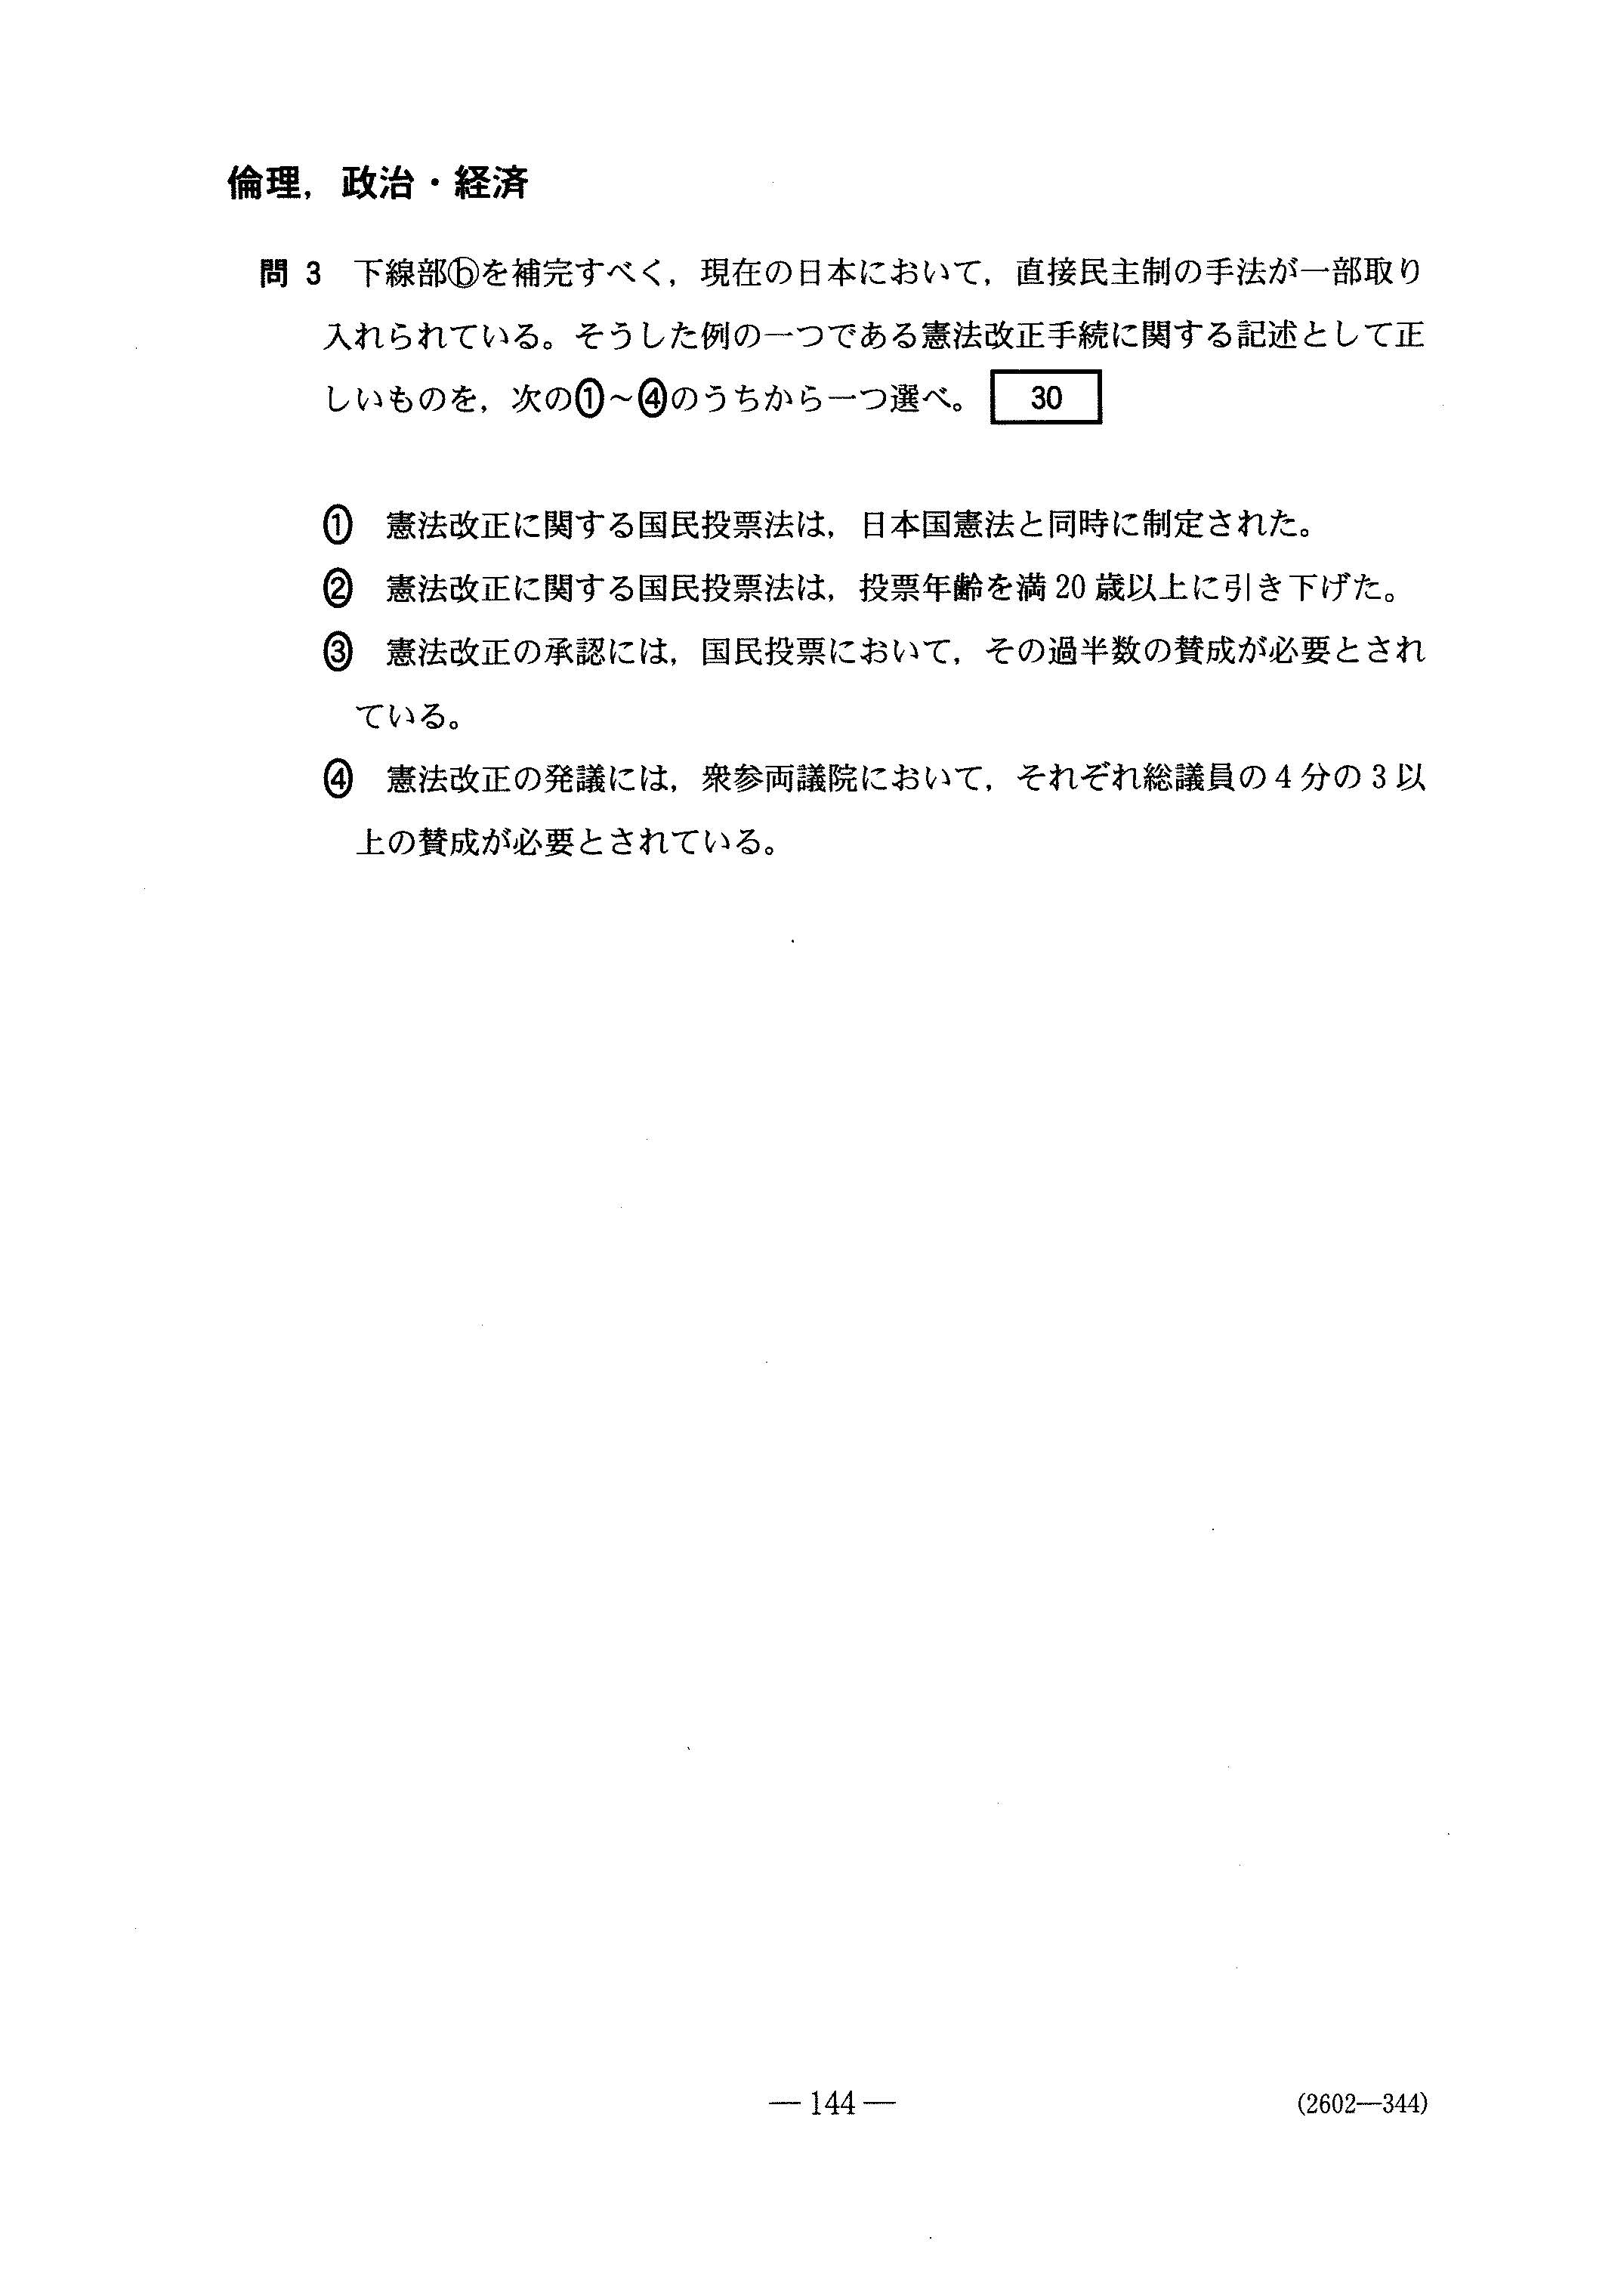 H28倫理,政治・経済 大学入試センター試験過去問